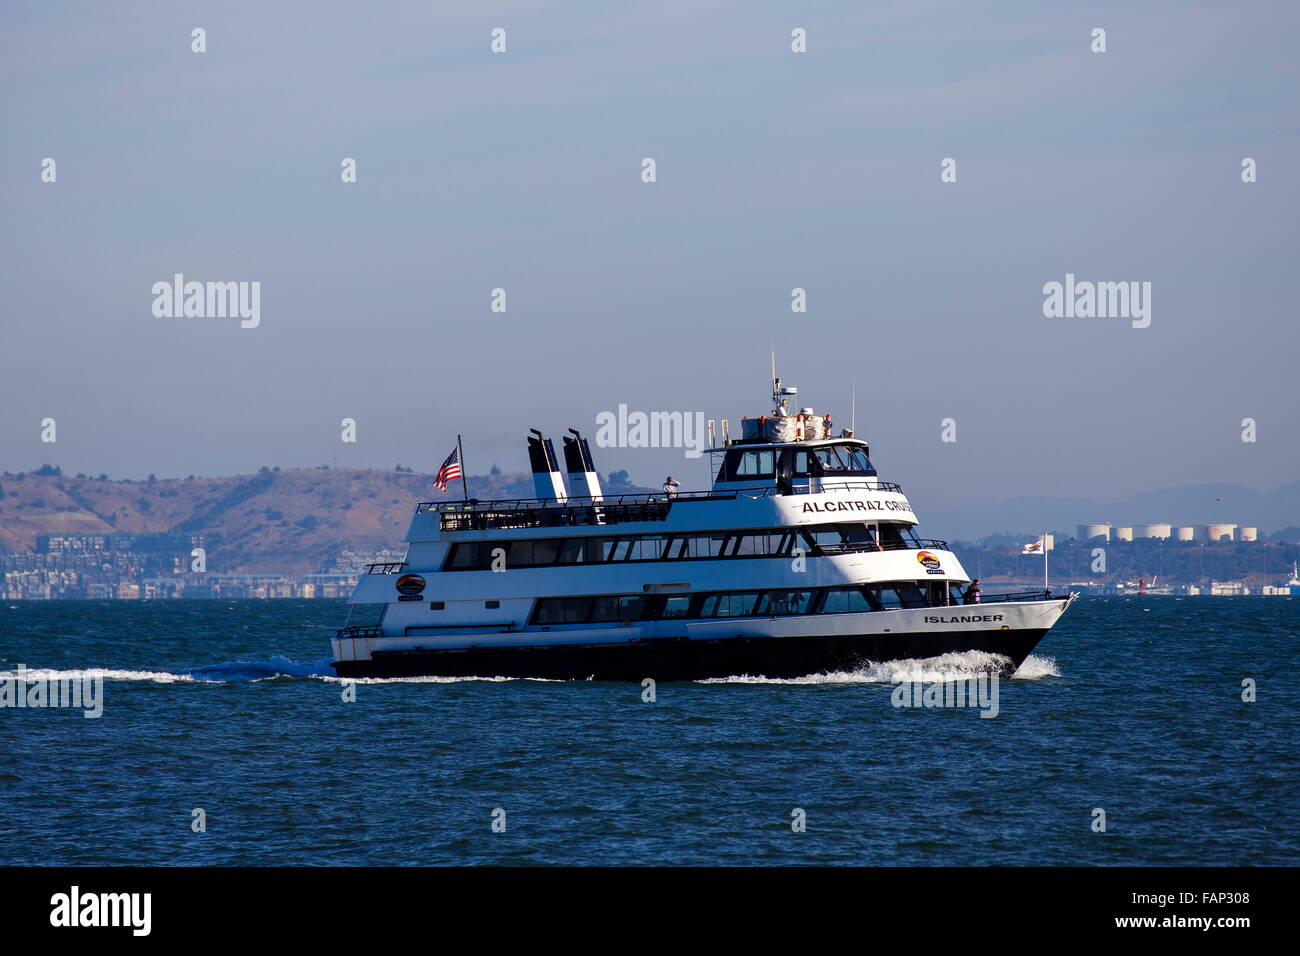 Alcatraz Cruises ferry in San Francisco, California - Stock Image